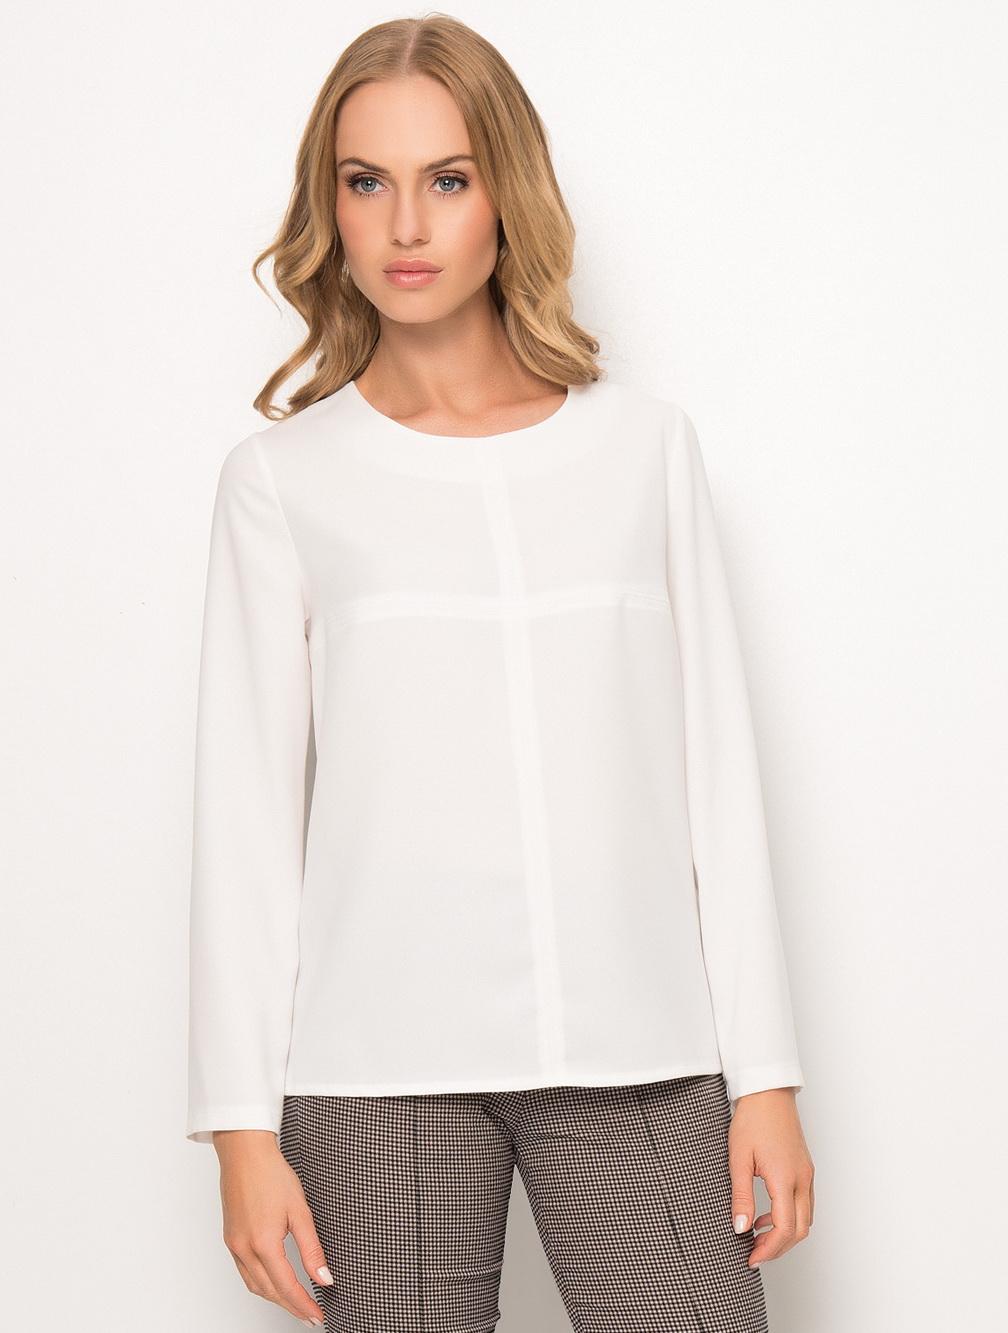 Осенняя белая блузка доставка